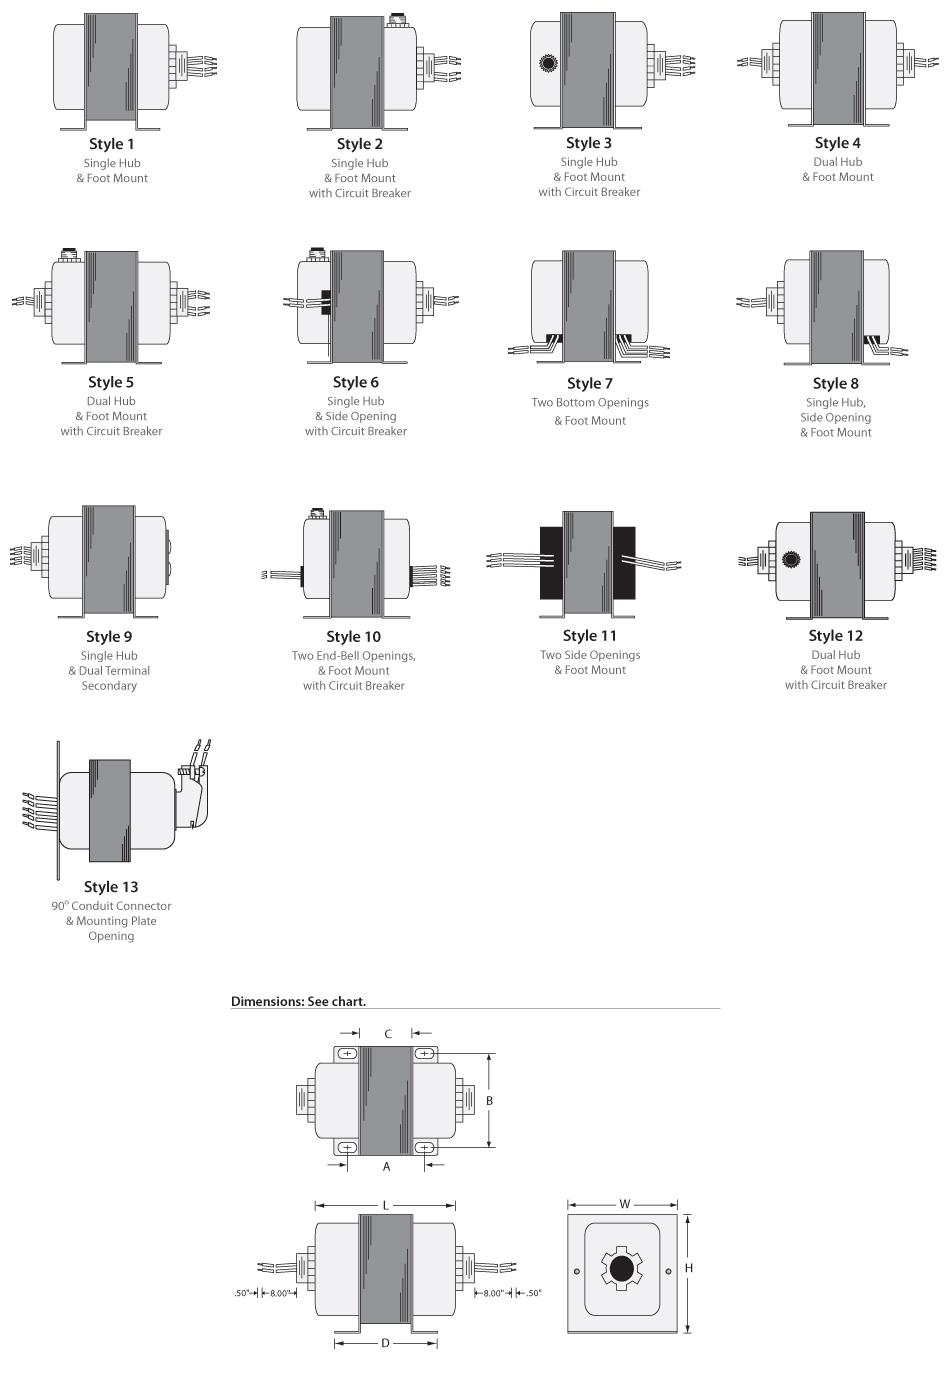 lionel type r wiring diagram